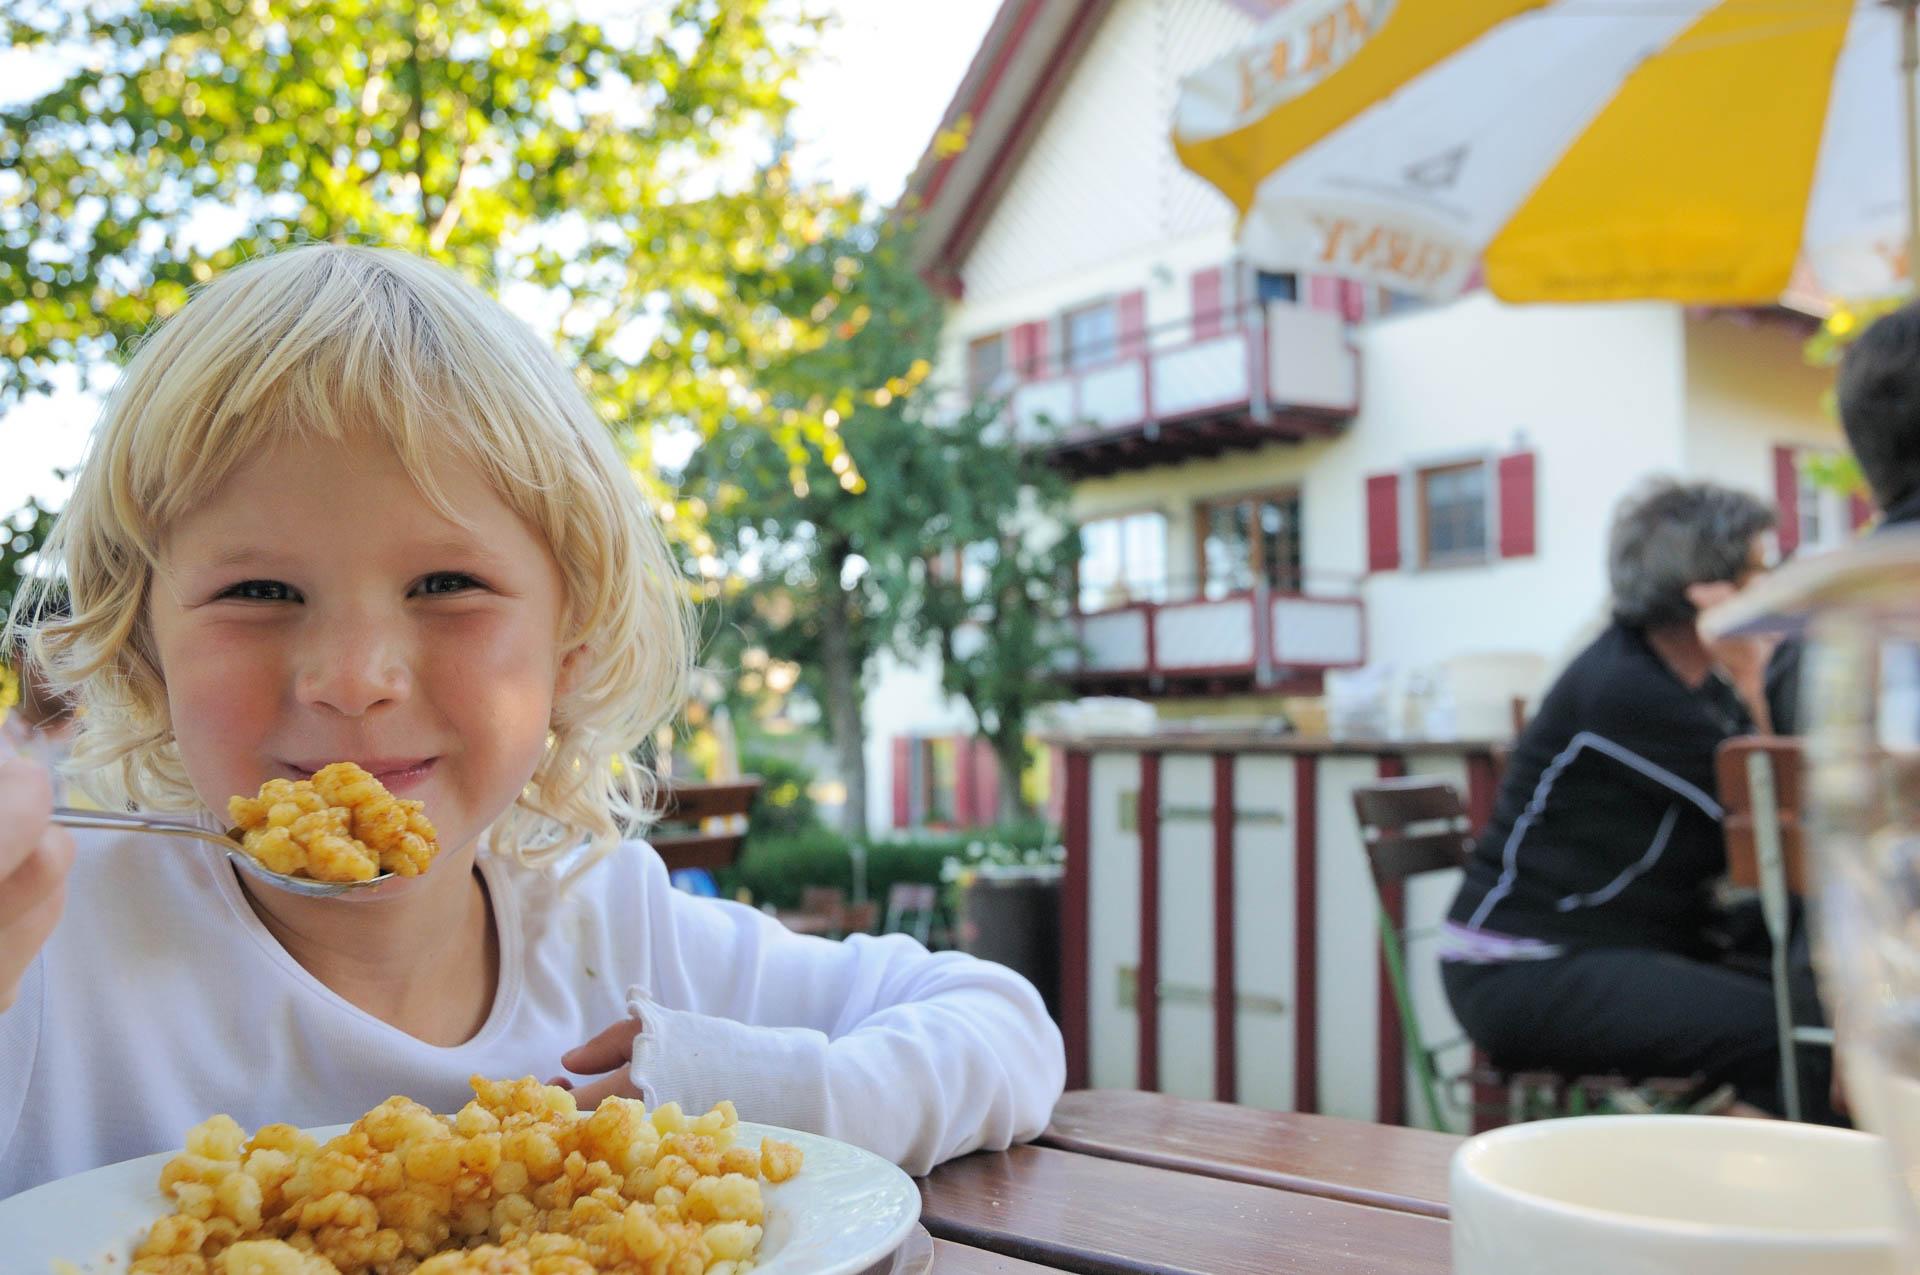 Spielen macht Appetit - Gasthaus Seerose in Nitzenweiler bei Kressbronn am Bodensee